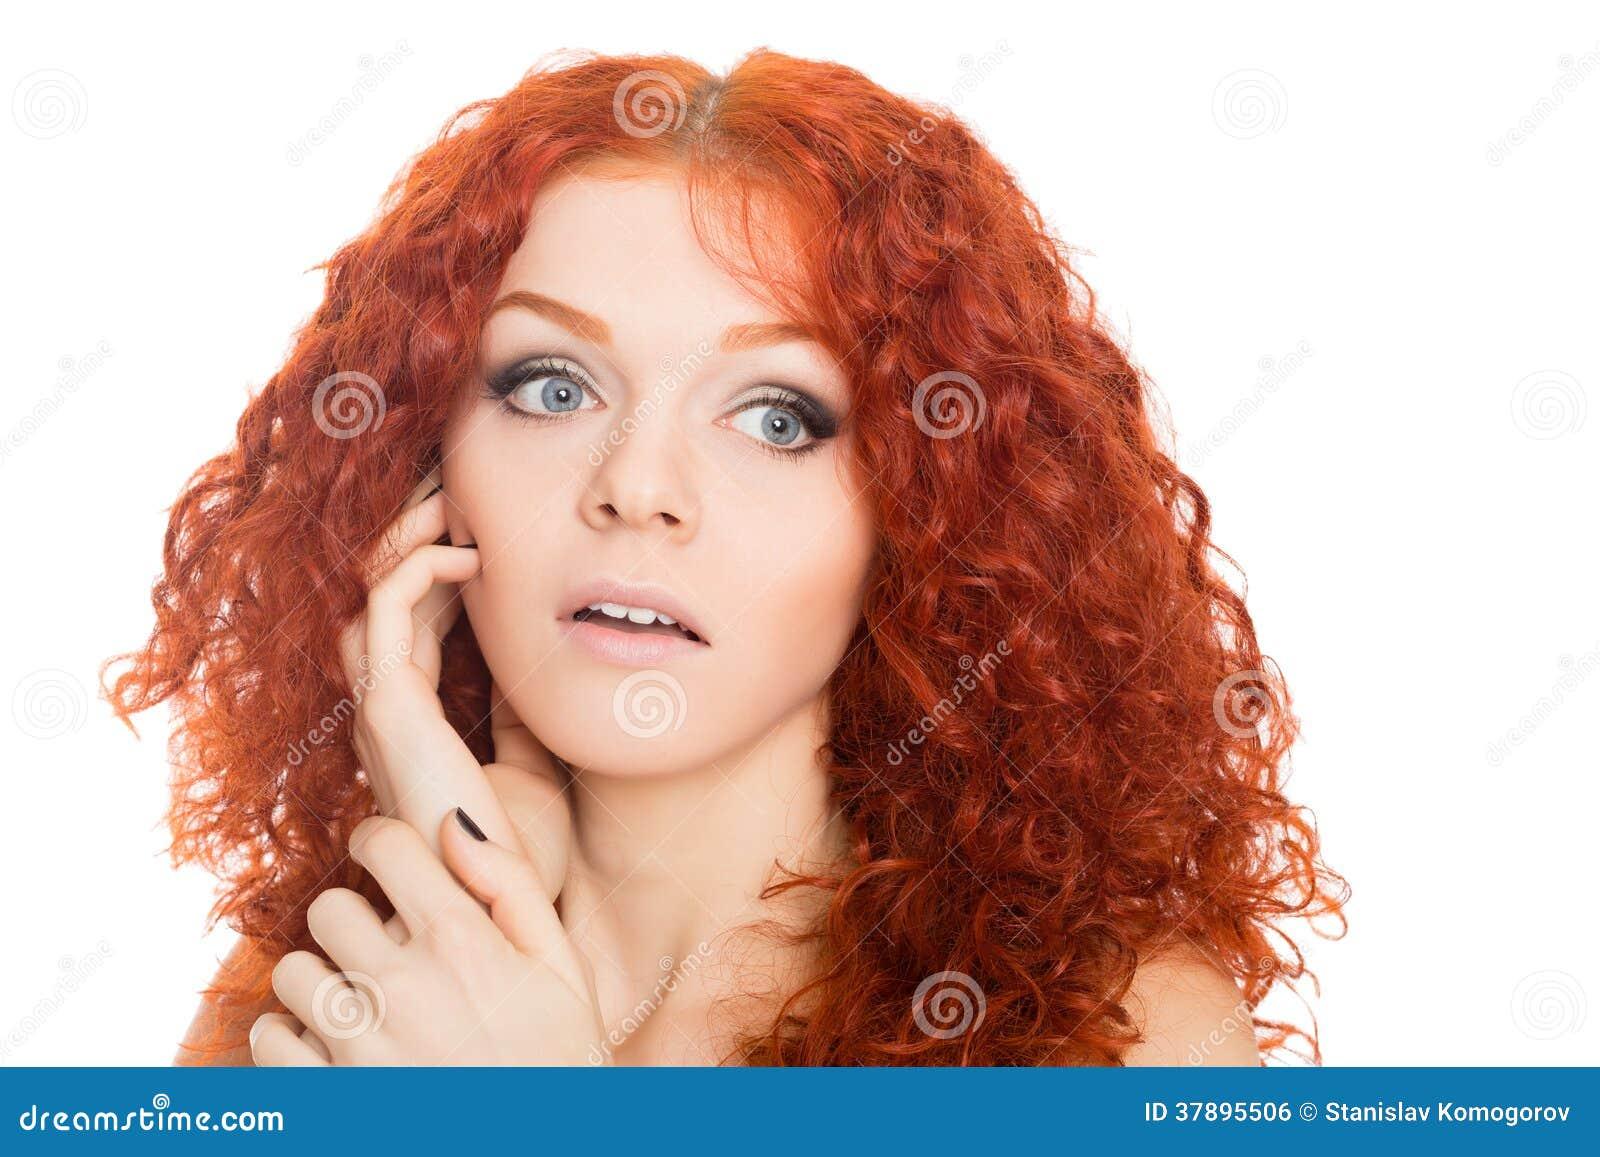 Mooi rood haired meisje met een verraste blik